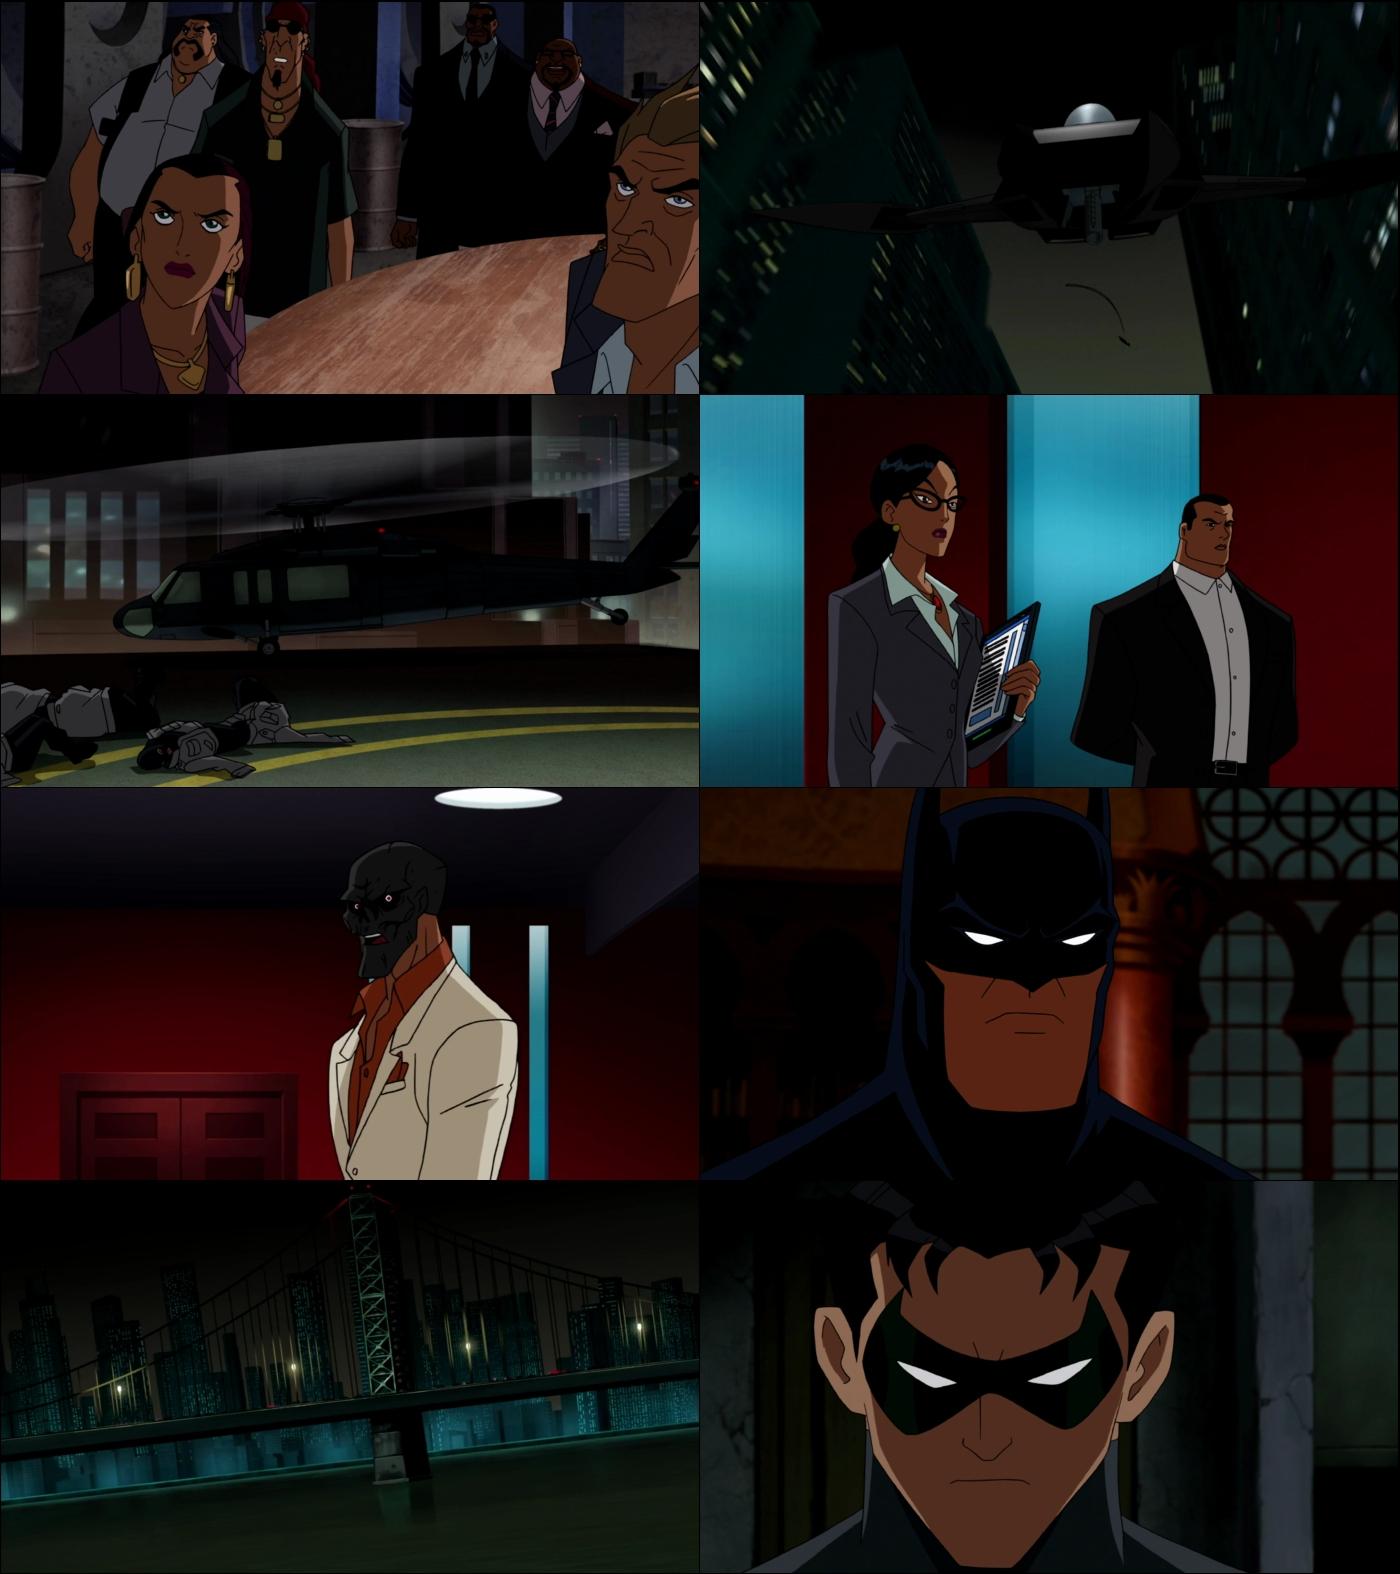 Batman Capucha roja 1080p Latino